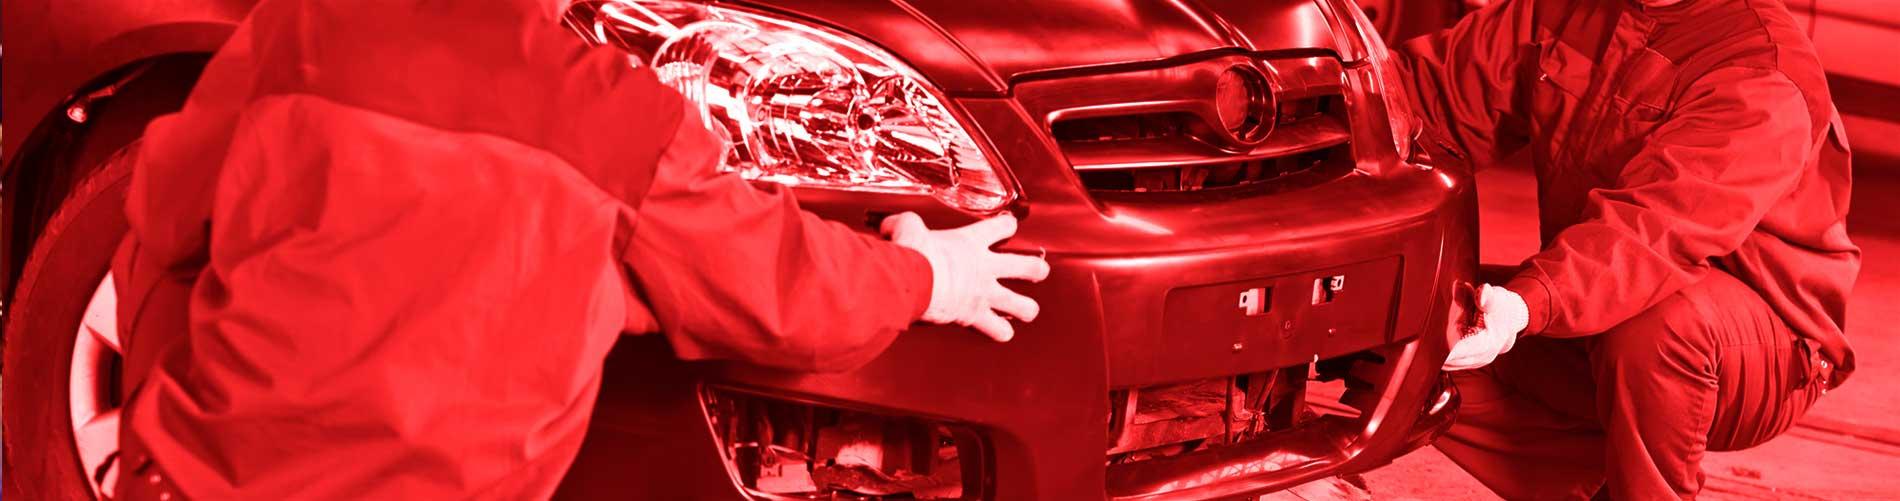 All Crash Parts >> All Crash Parts Auto Parts Group Australian Car Parts